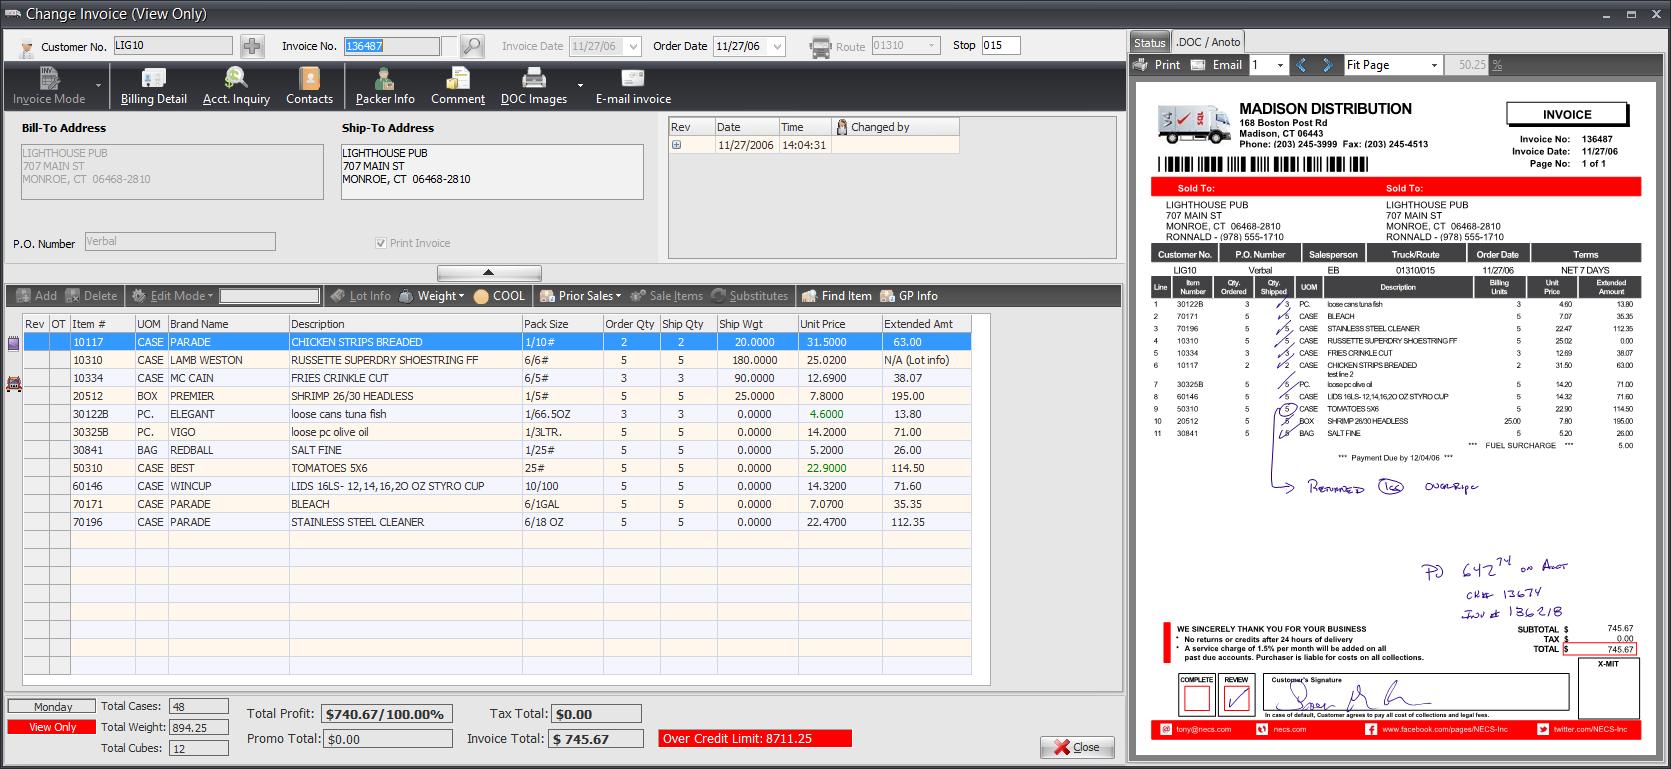 Anoto Digital Pen Promotion - Digital invoice software